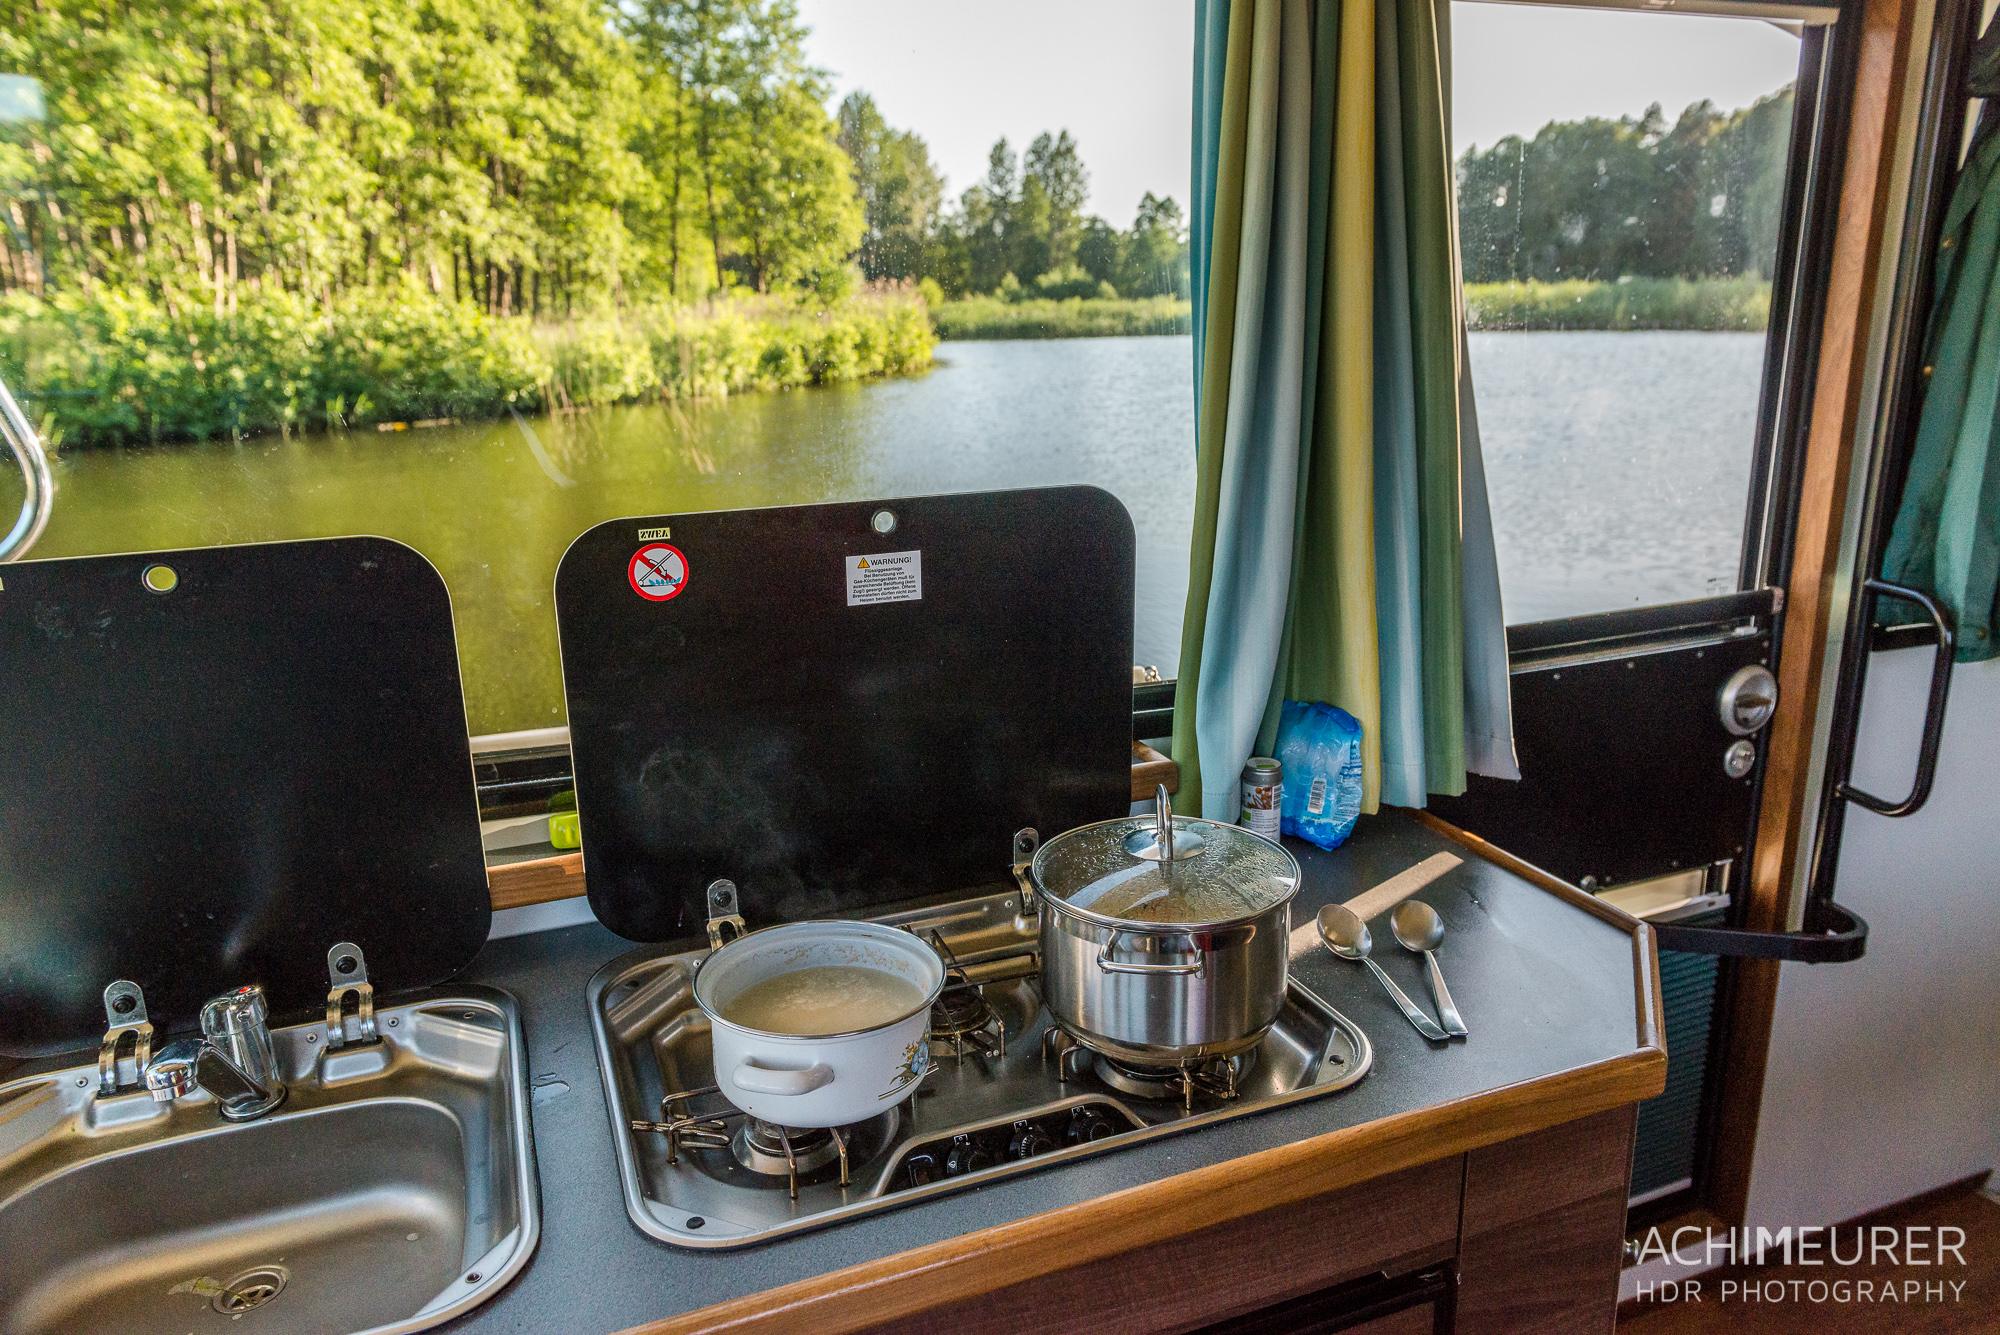 Hausboot-Kuhnle-Mueritz-Mecklenburg-Vorpommern-See_3342